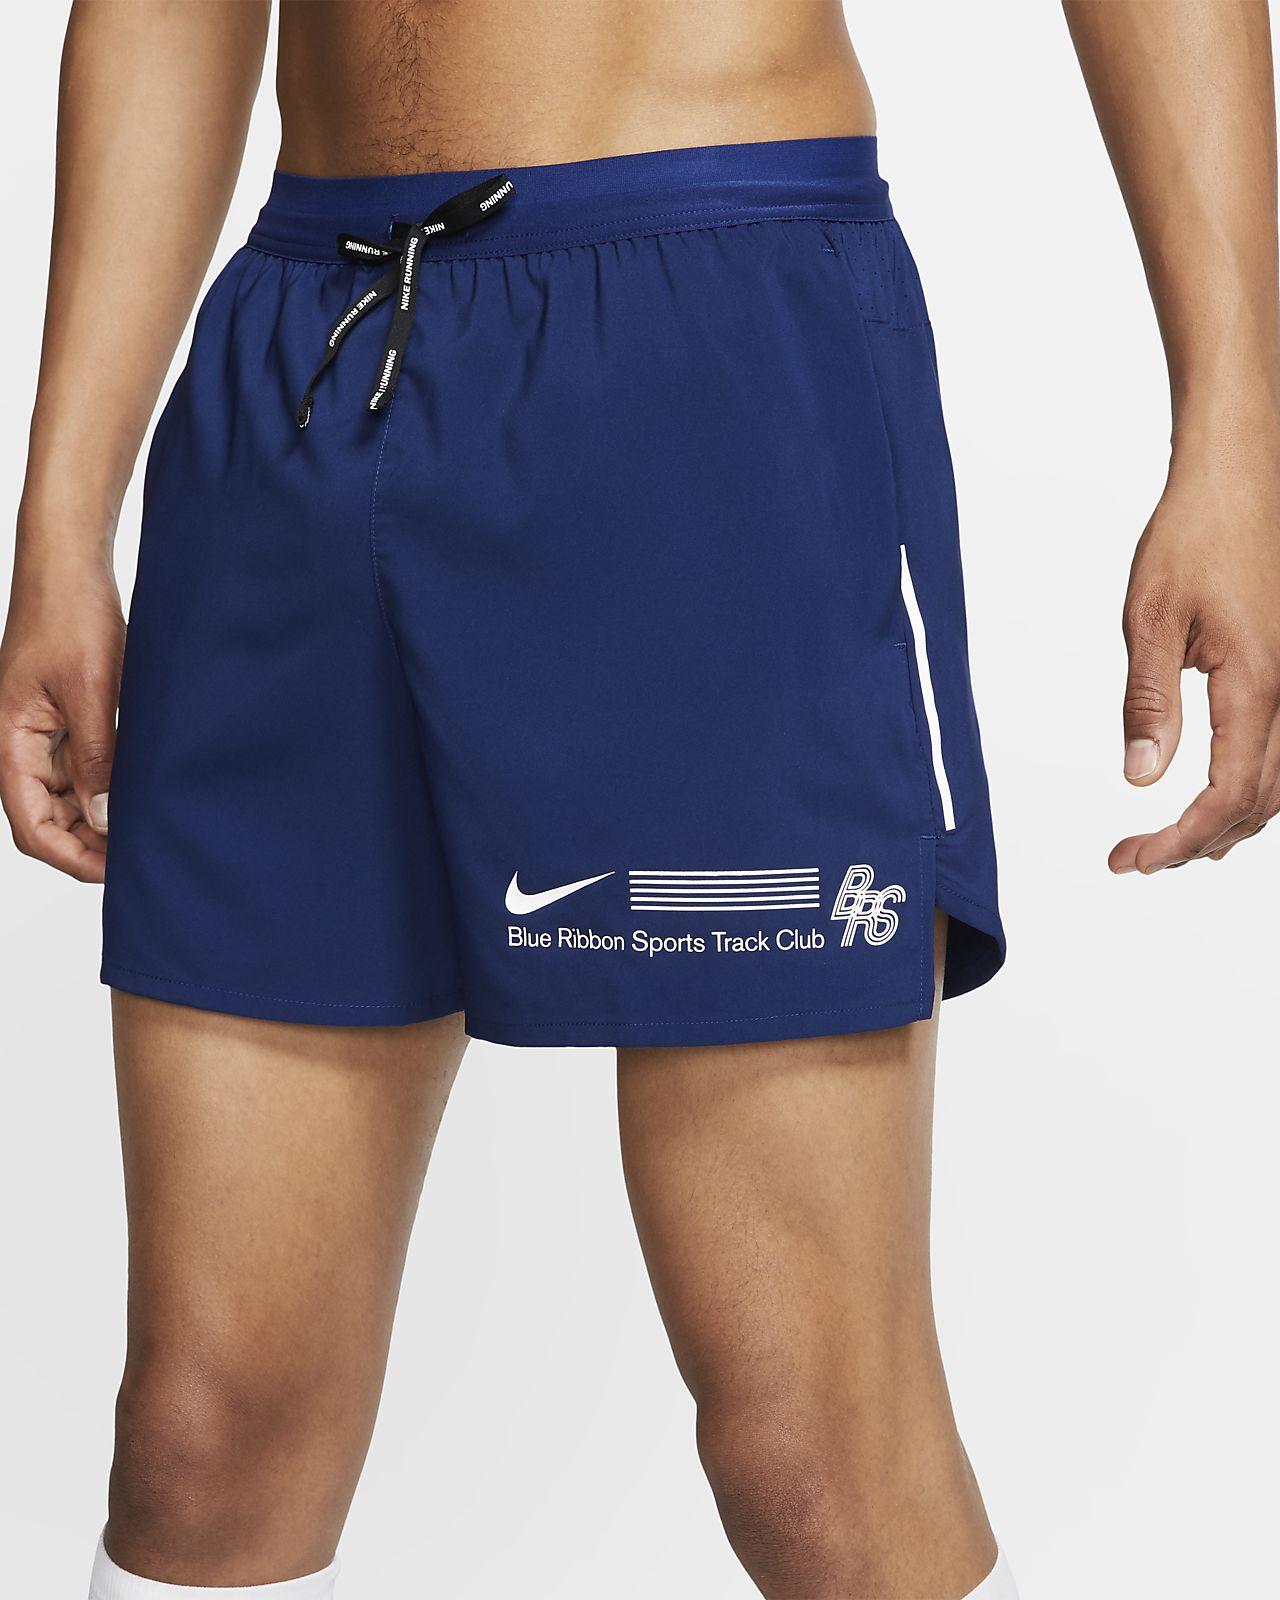 Nike Flex Stride BRS Pantalons curts folrats de 13 cm de running - Home